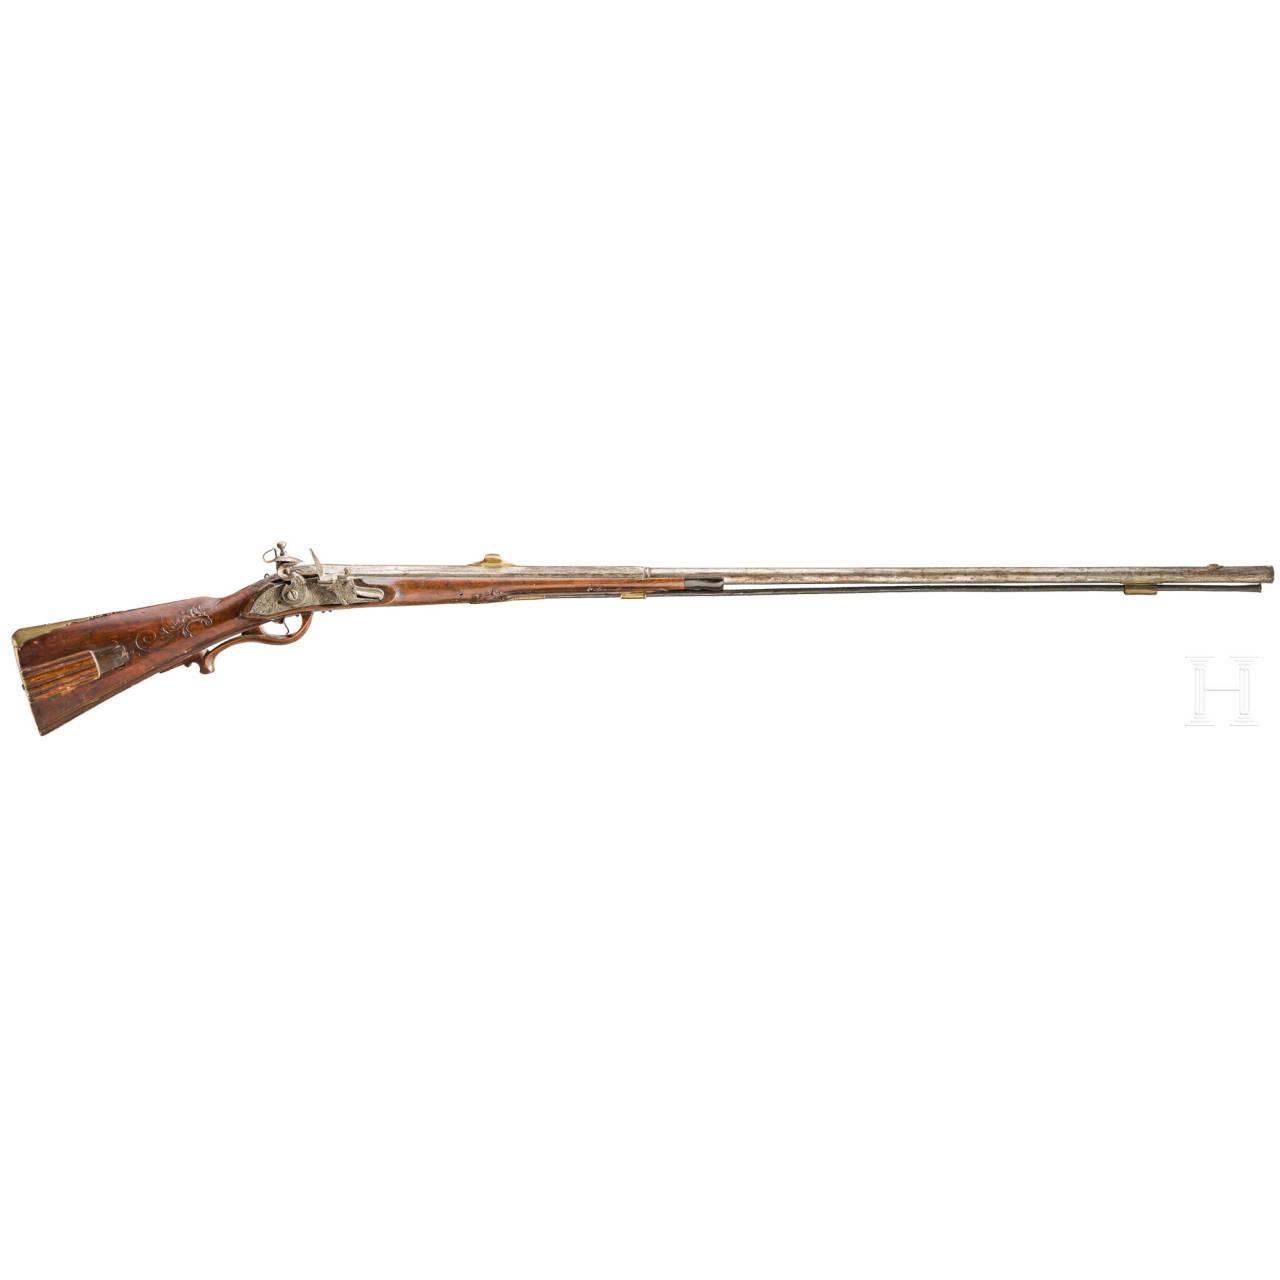 A flintlock rifle, Johann Puchner, German, ca. 1700